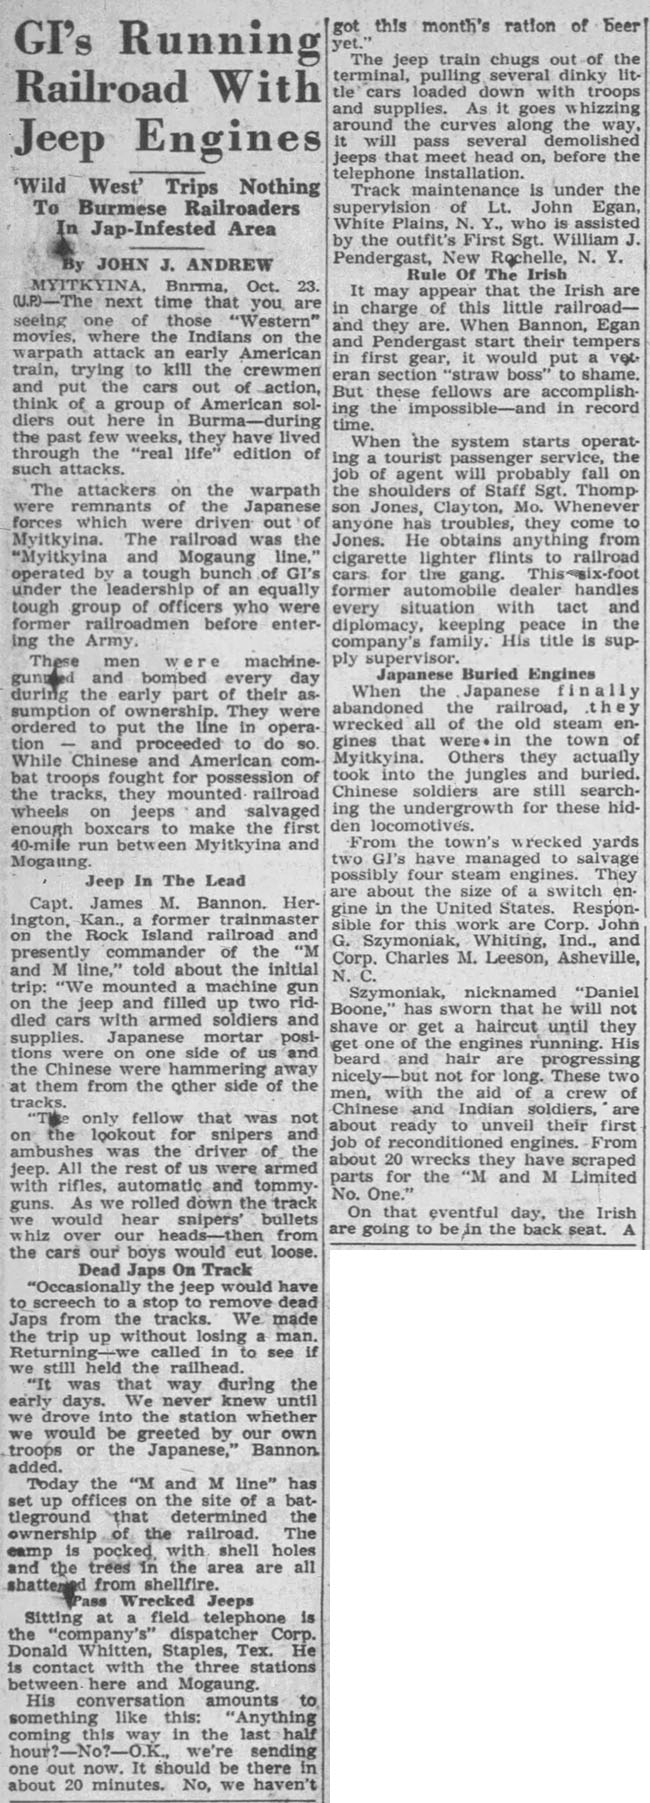 1944-10-23-tucson-daily-citizen-jeep-trains-lores